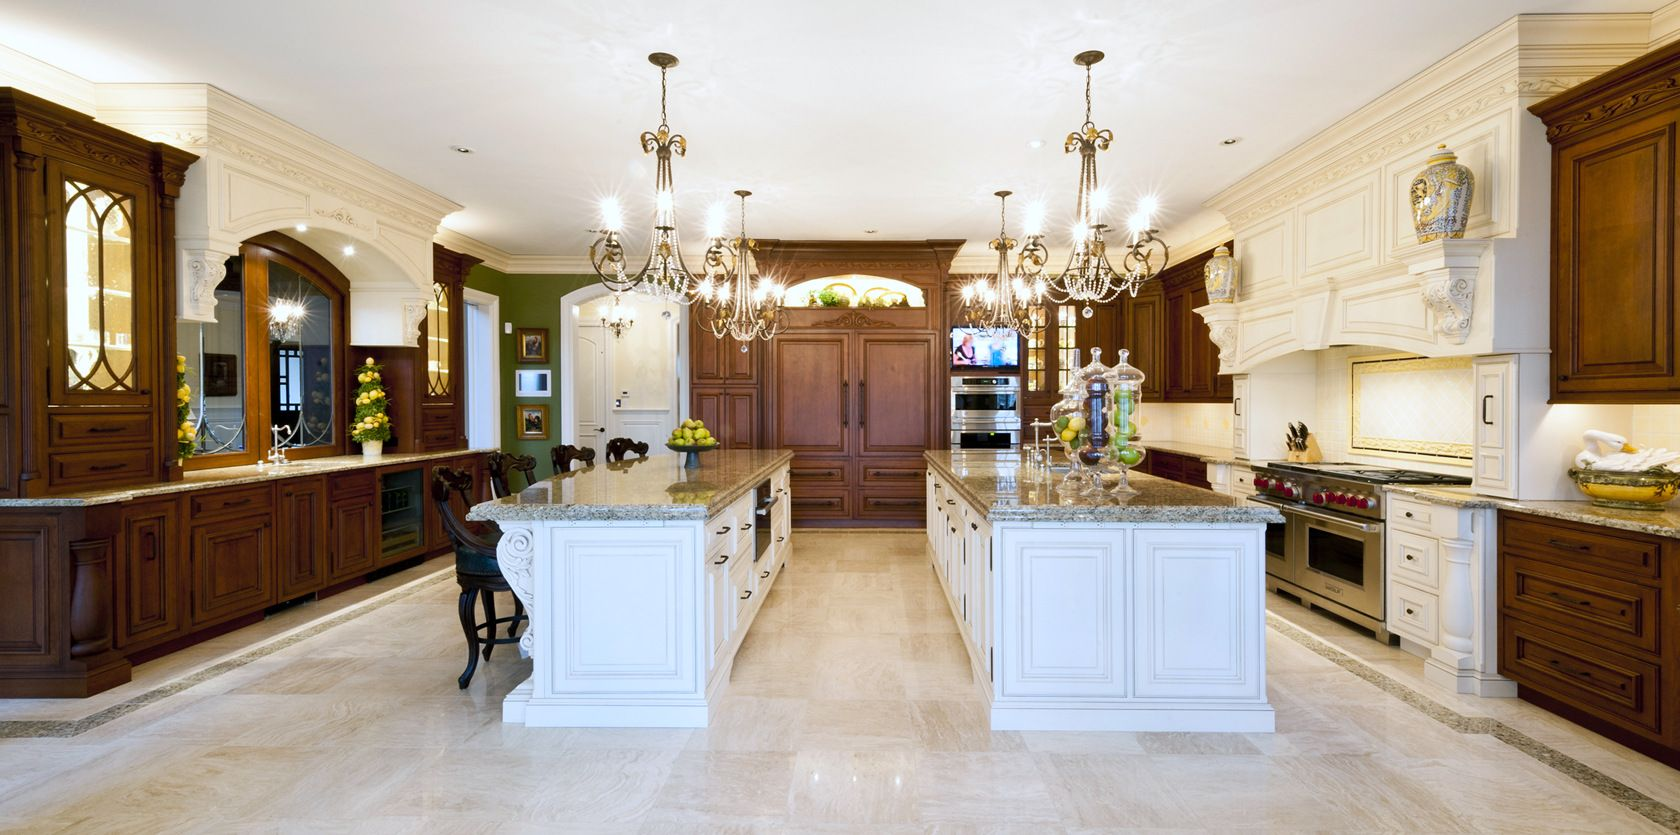 Custom Double Island Kitchen Design by CVL Designs, Ocean ...